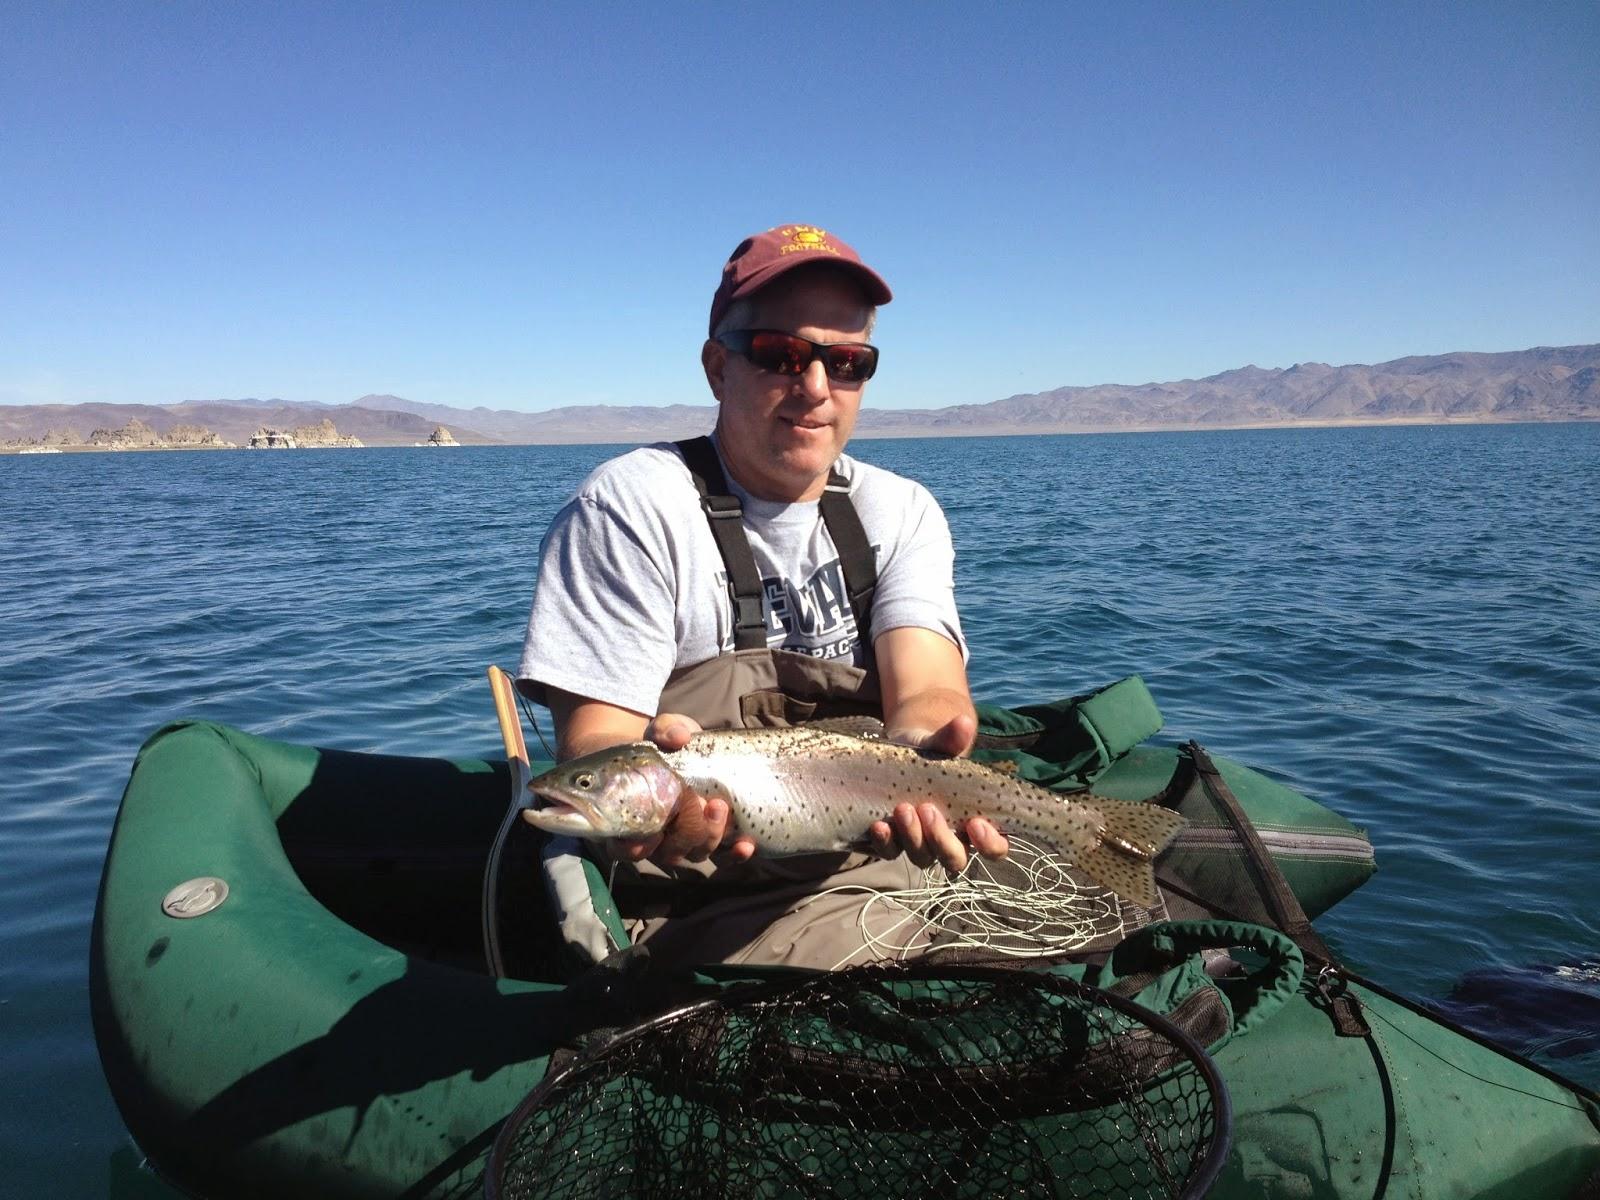 Northern sierra fly fishing pyramid lake 10 14 14 for Sierra fly fishing